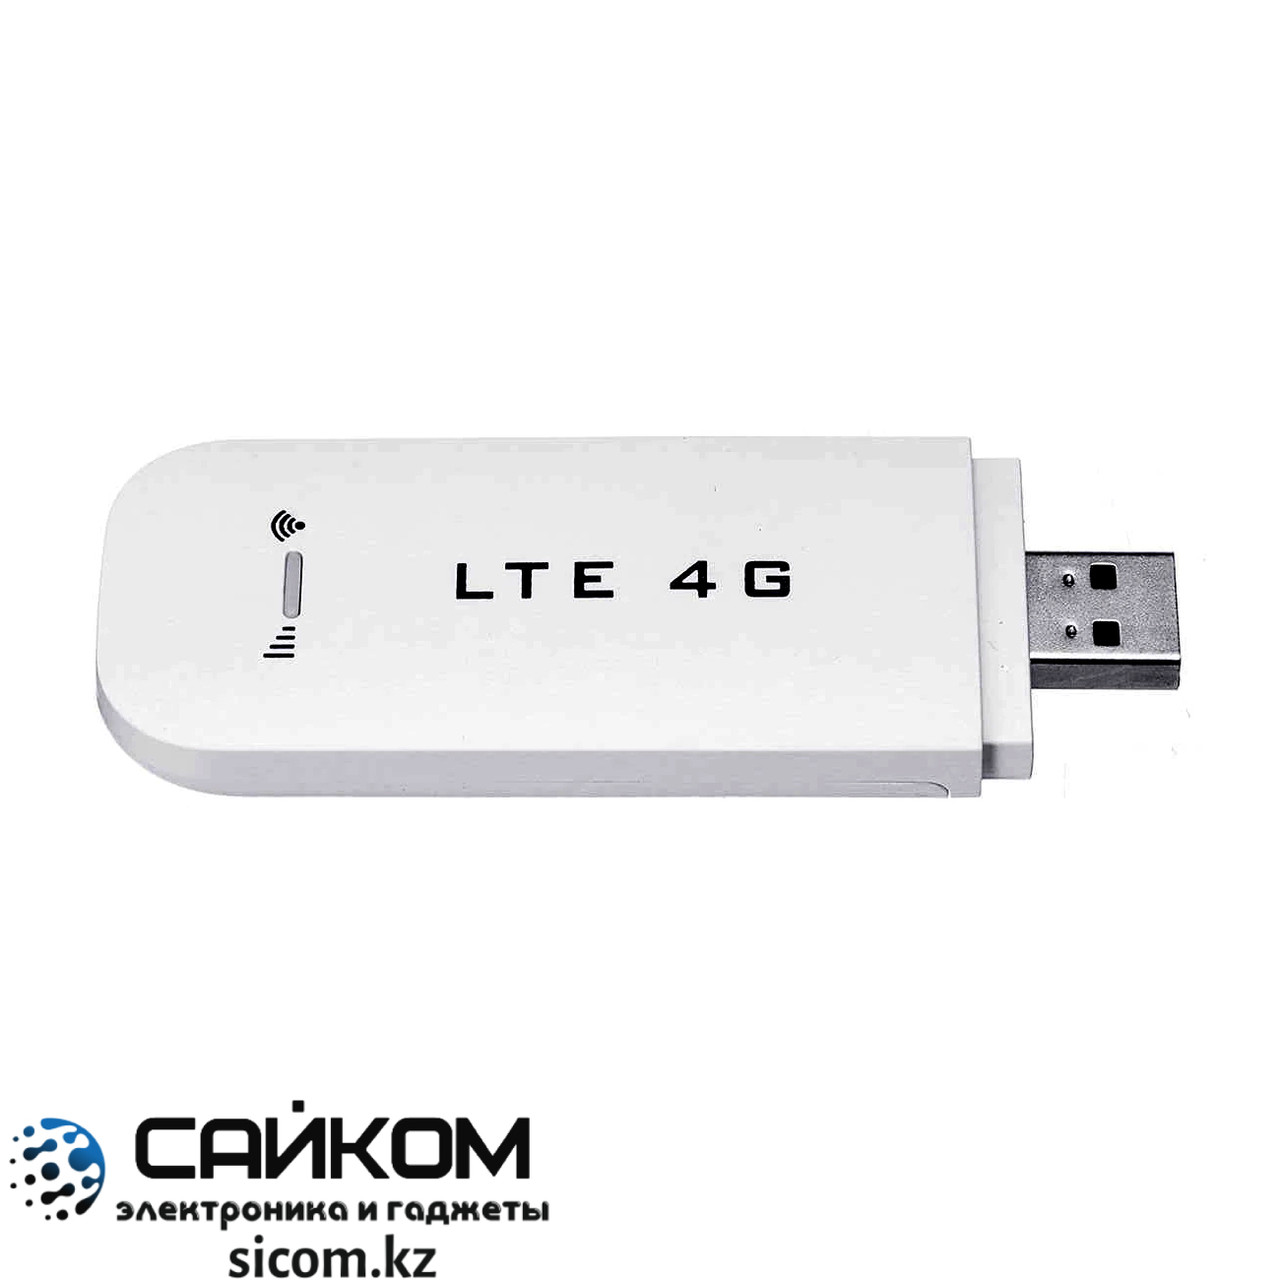 4G USB Wi-Fi Wireless Модем Altel, Tele 2, Activ, Beeline / 150 Мбит/с - фото 3